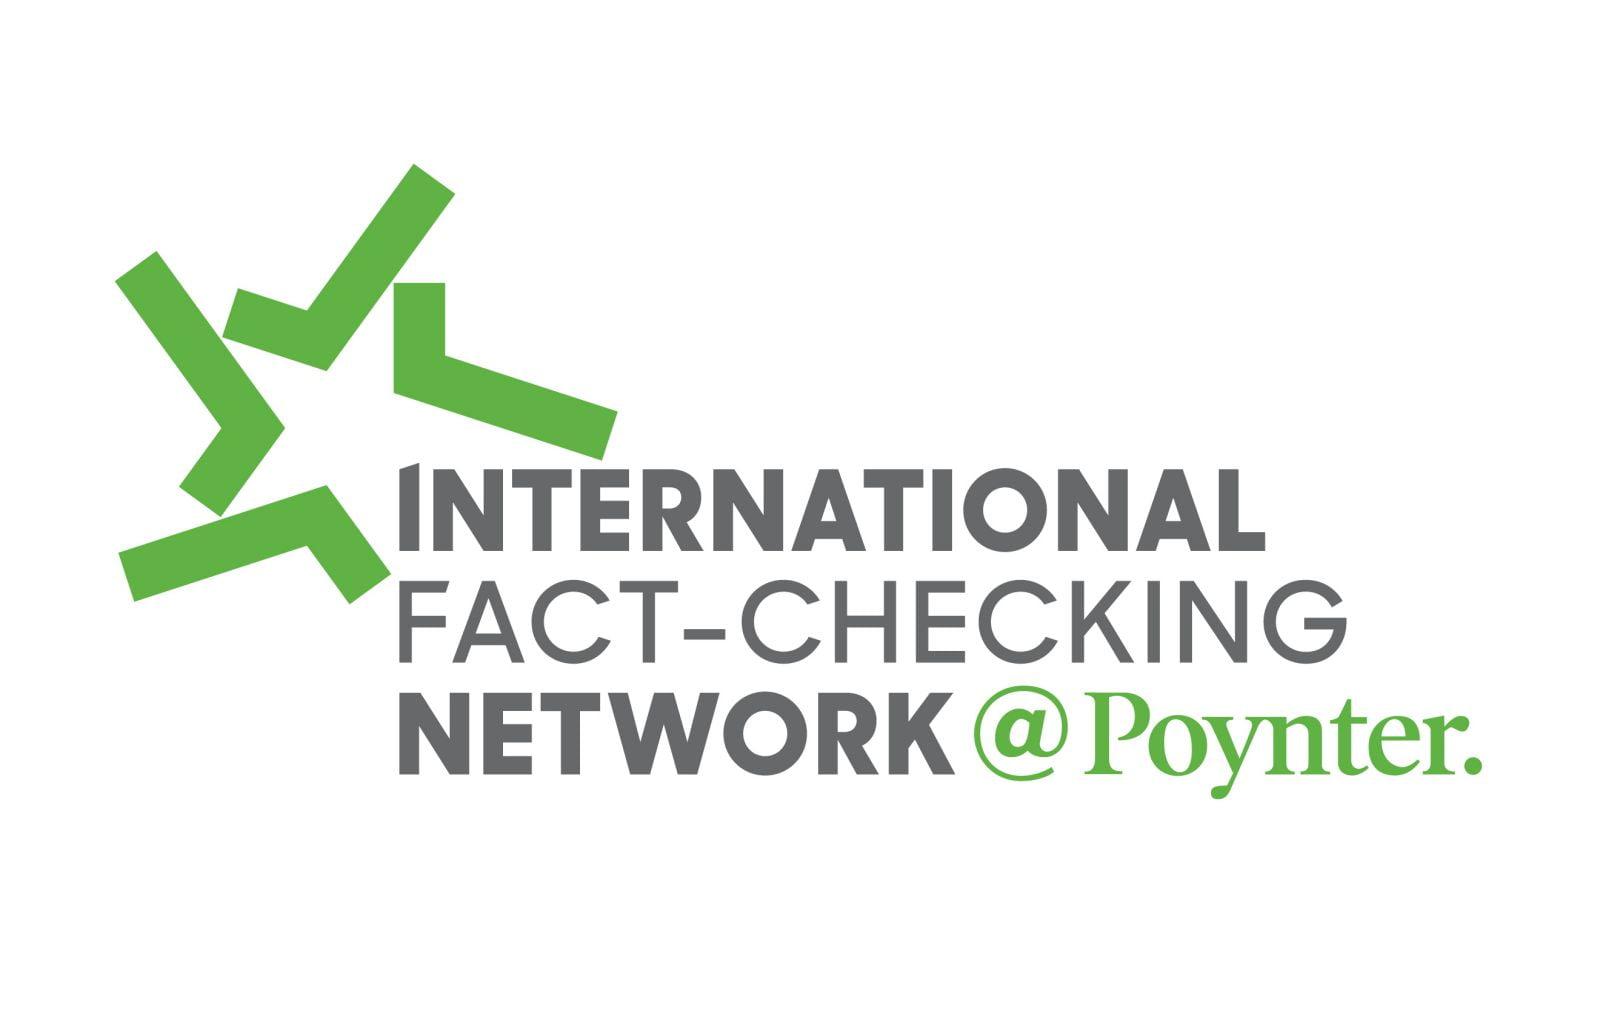 WhatsApp Launches New COVID-19 Fact-Checker Bot